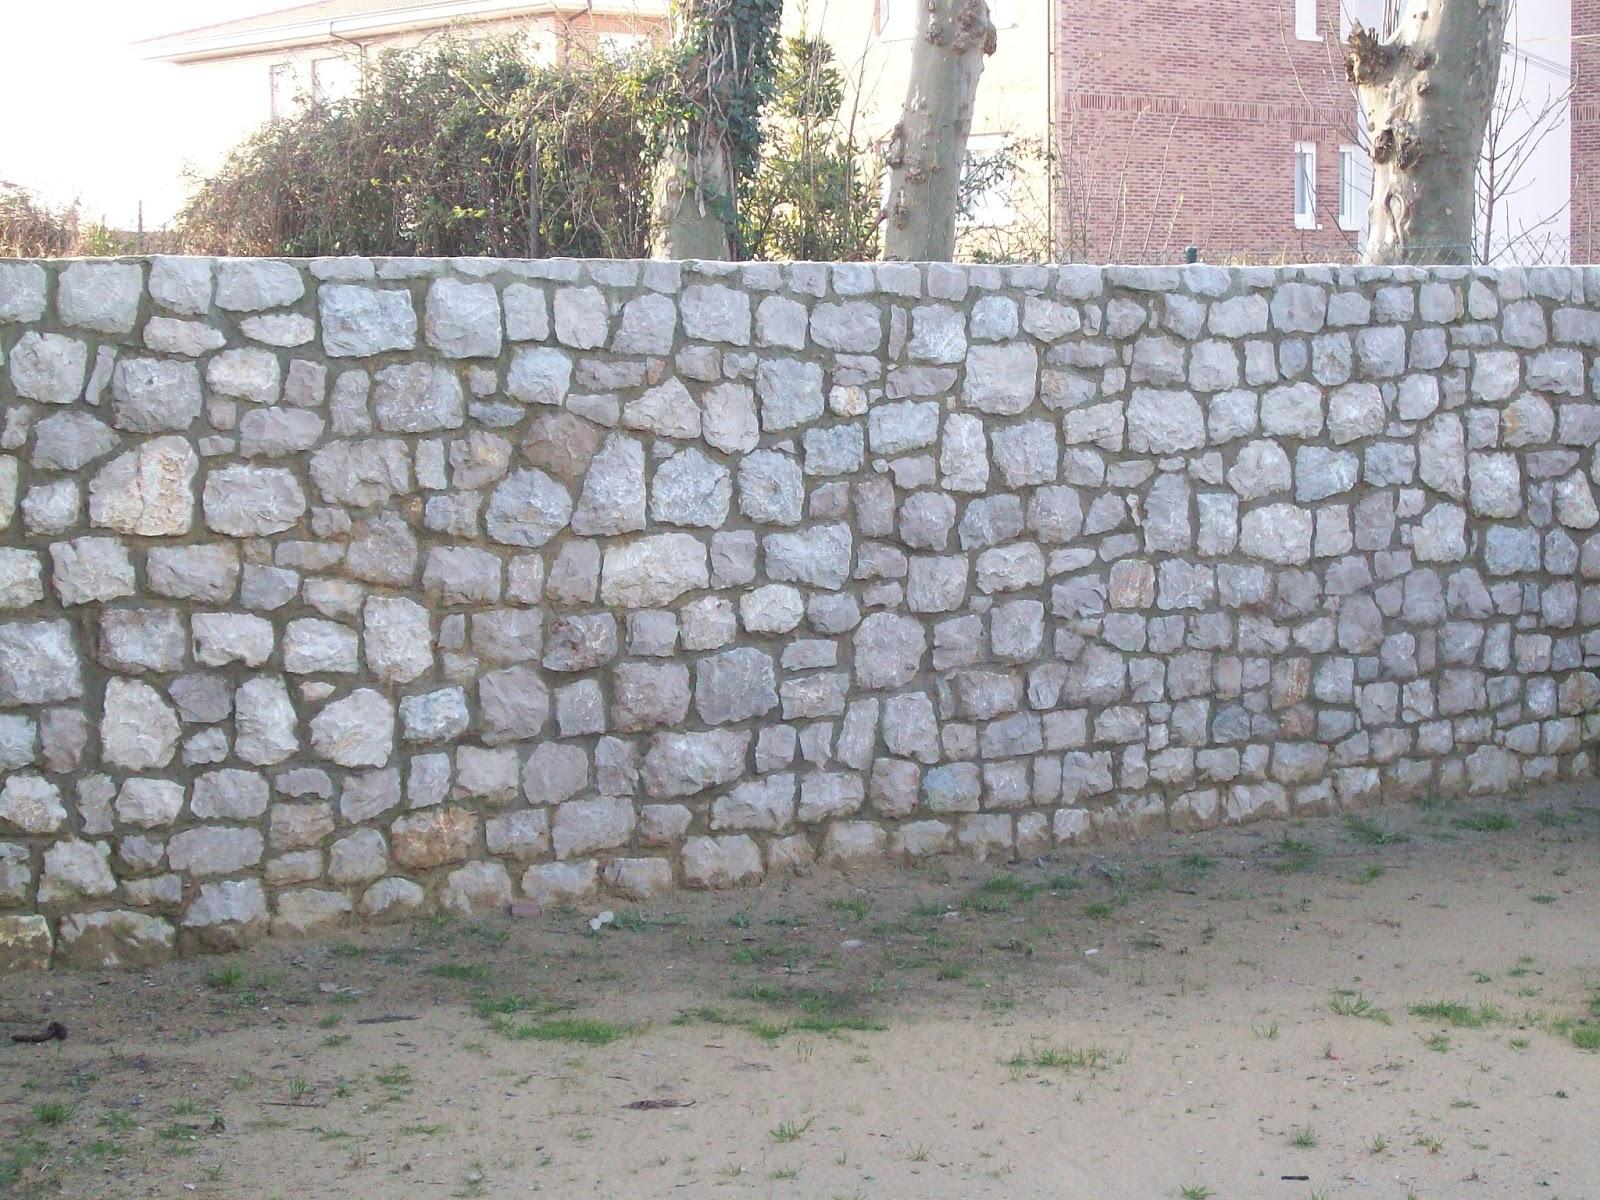 Canteria artesanal febrero 2016 - Piedra de silleria ...